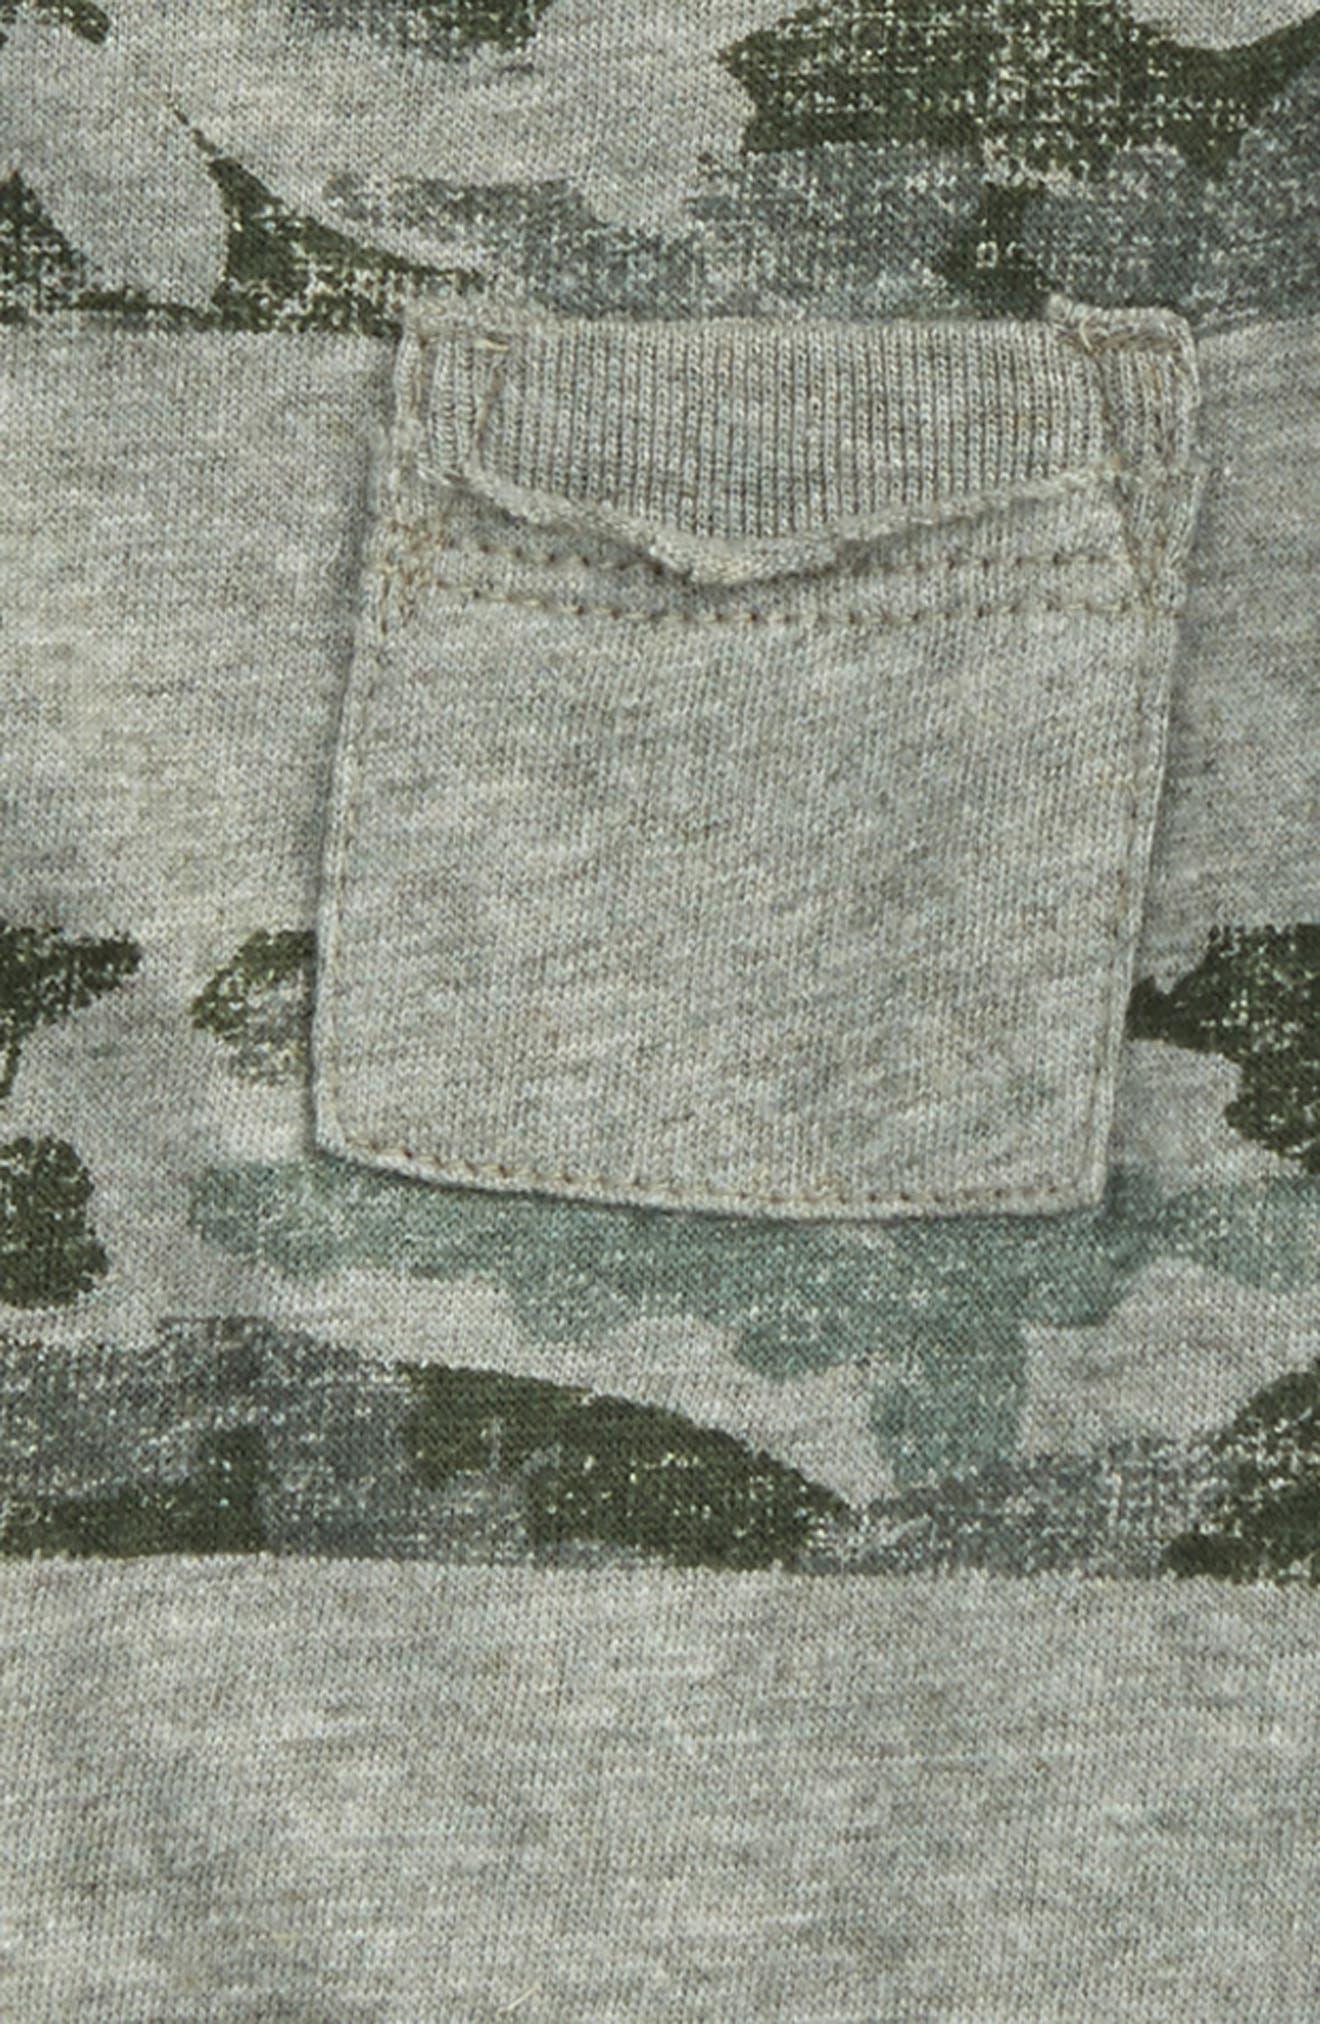 Alternate Image 2  - Burt's Bees Baby Camo Print Organic Cotton Pocket T-Shirt (Baby Boys)